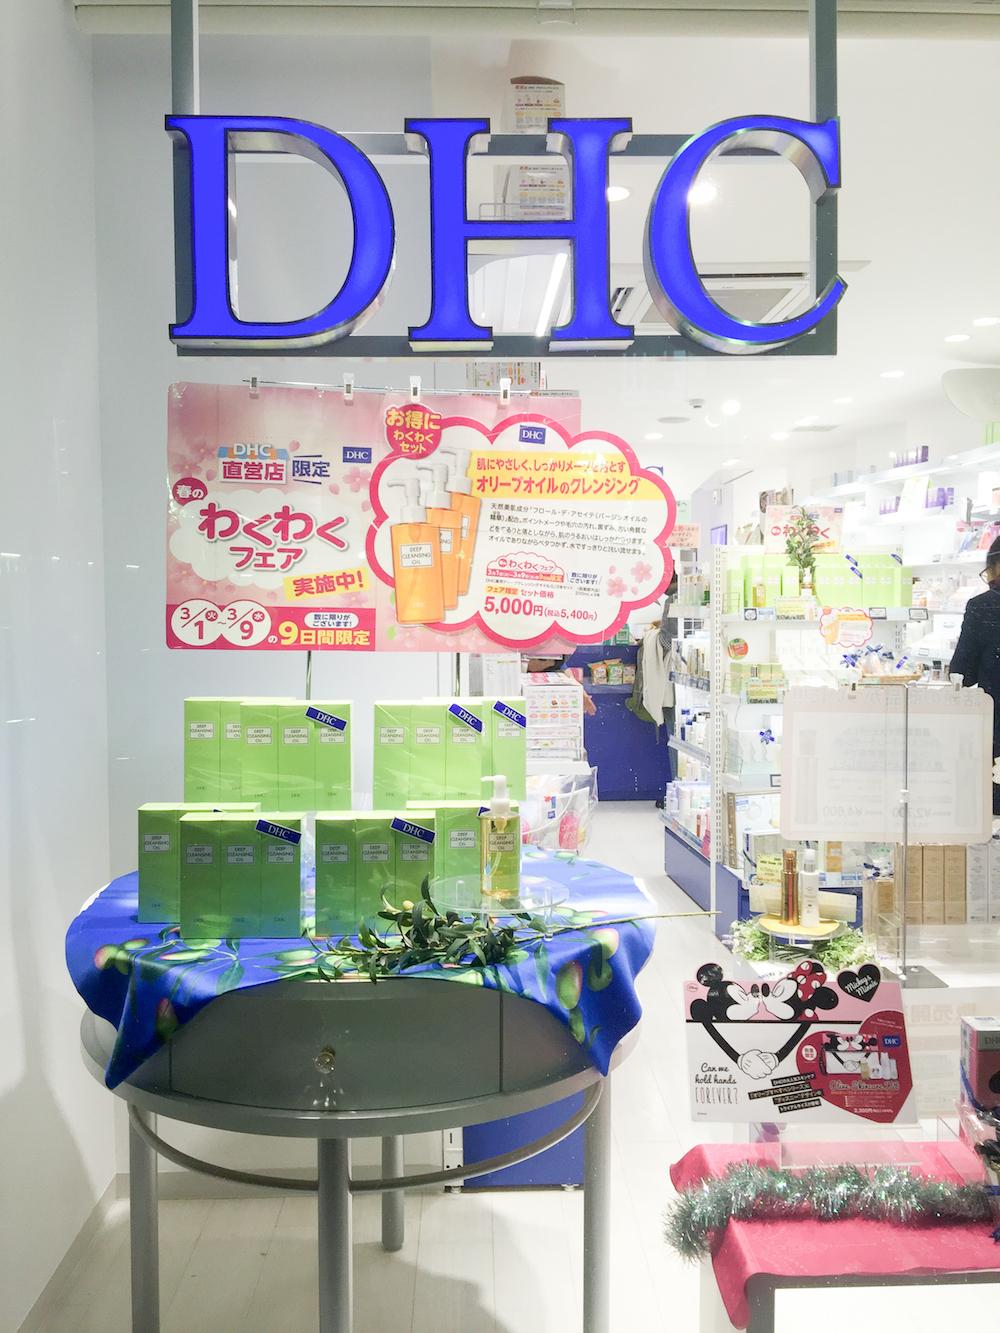 dhc-beauty-store-tokyo-shibuya-station-shopping-japan